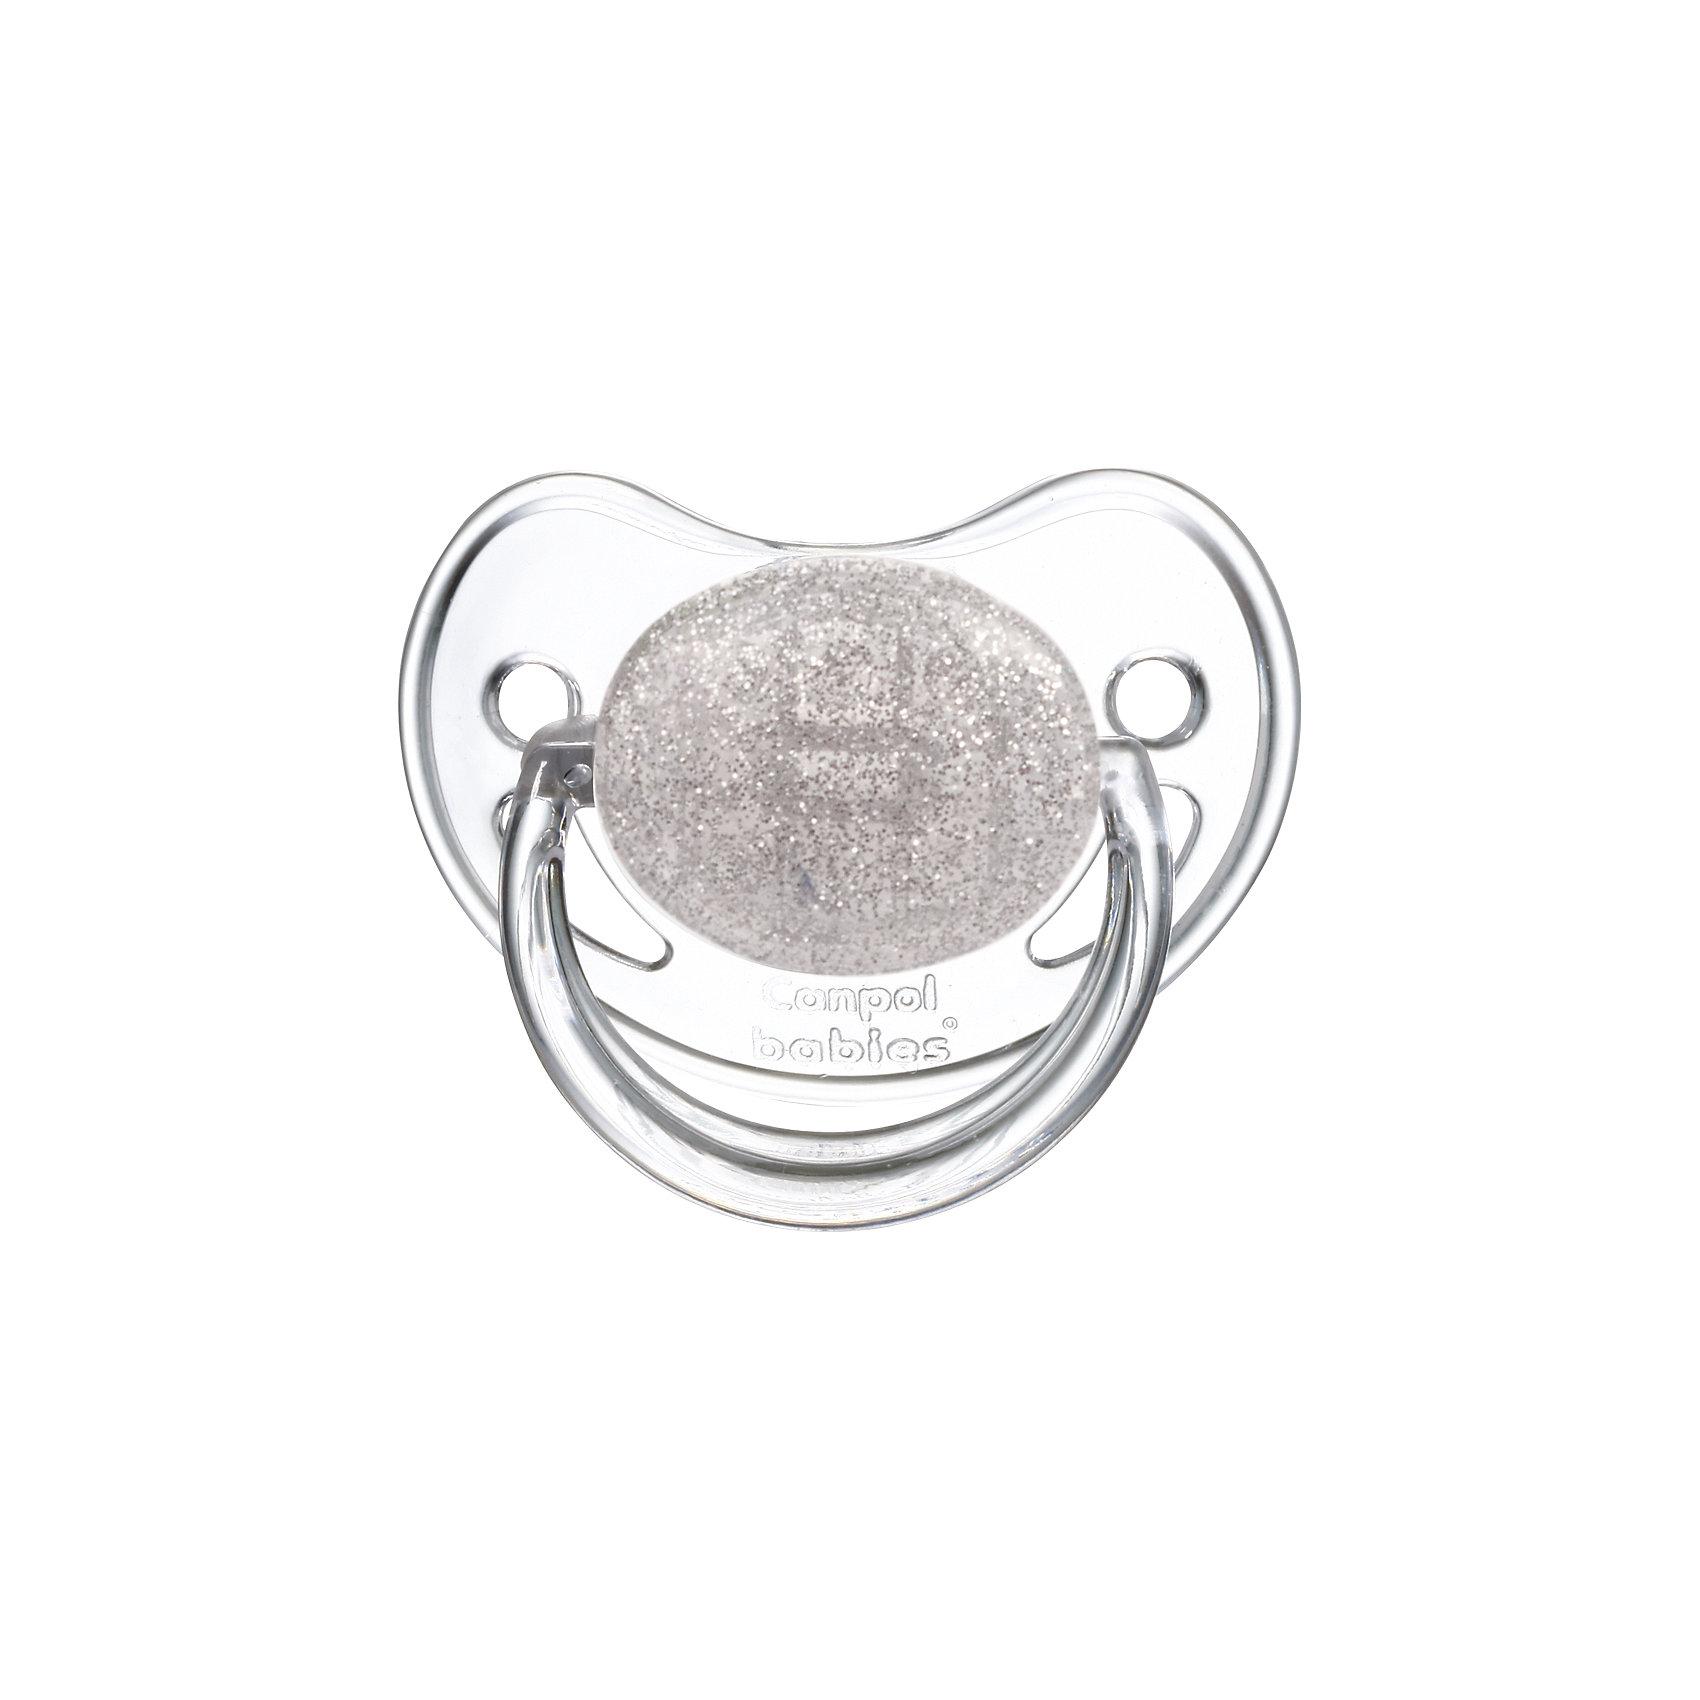 Пустышка круглая латексная, 0-6 Moonlight, Canpol Babies, серый